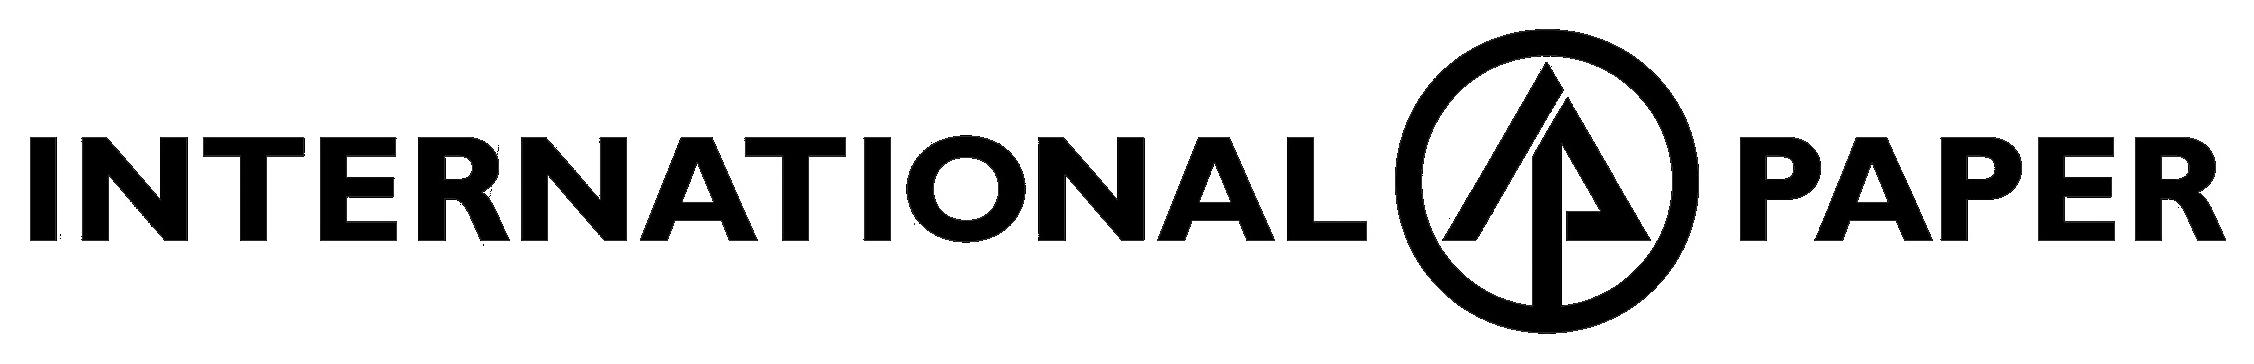 PNGPIX-COM-International-Paper-Logo-PNG-Transparent_cropped